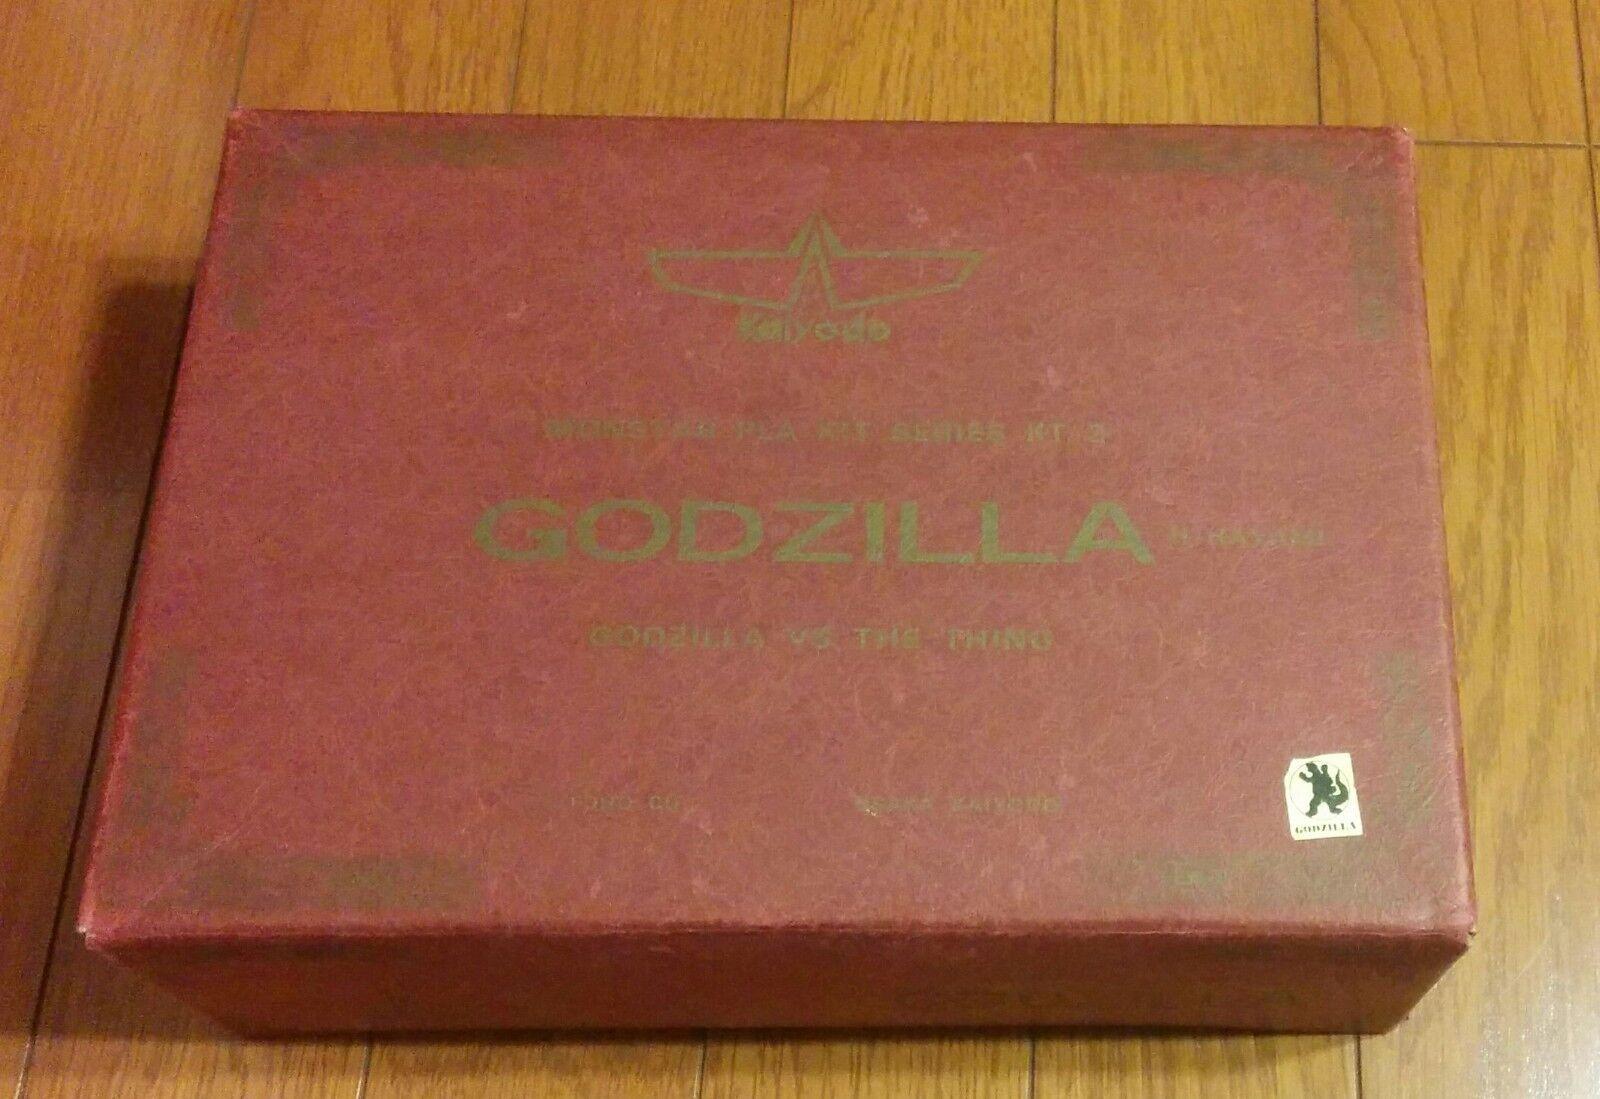 Kaiyodo Godzilla vs. the Thing Urethane Resin Cast Model Kit Rare Japan Kaiju